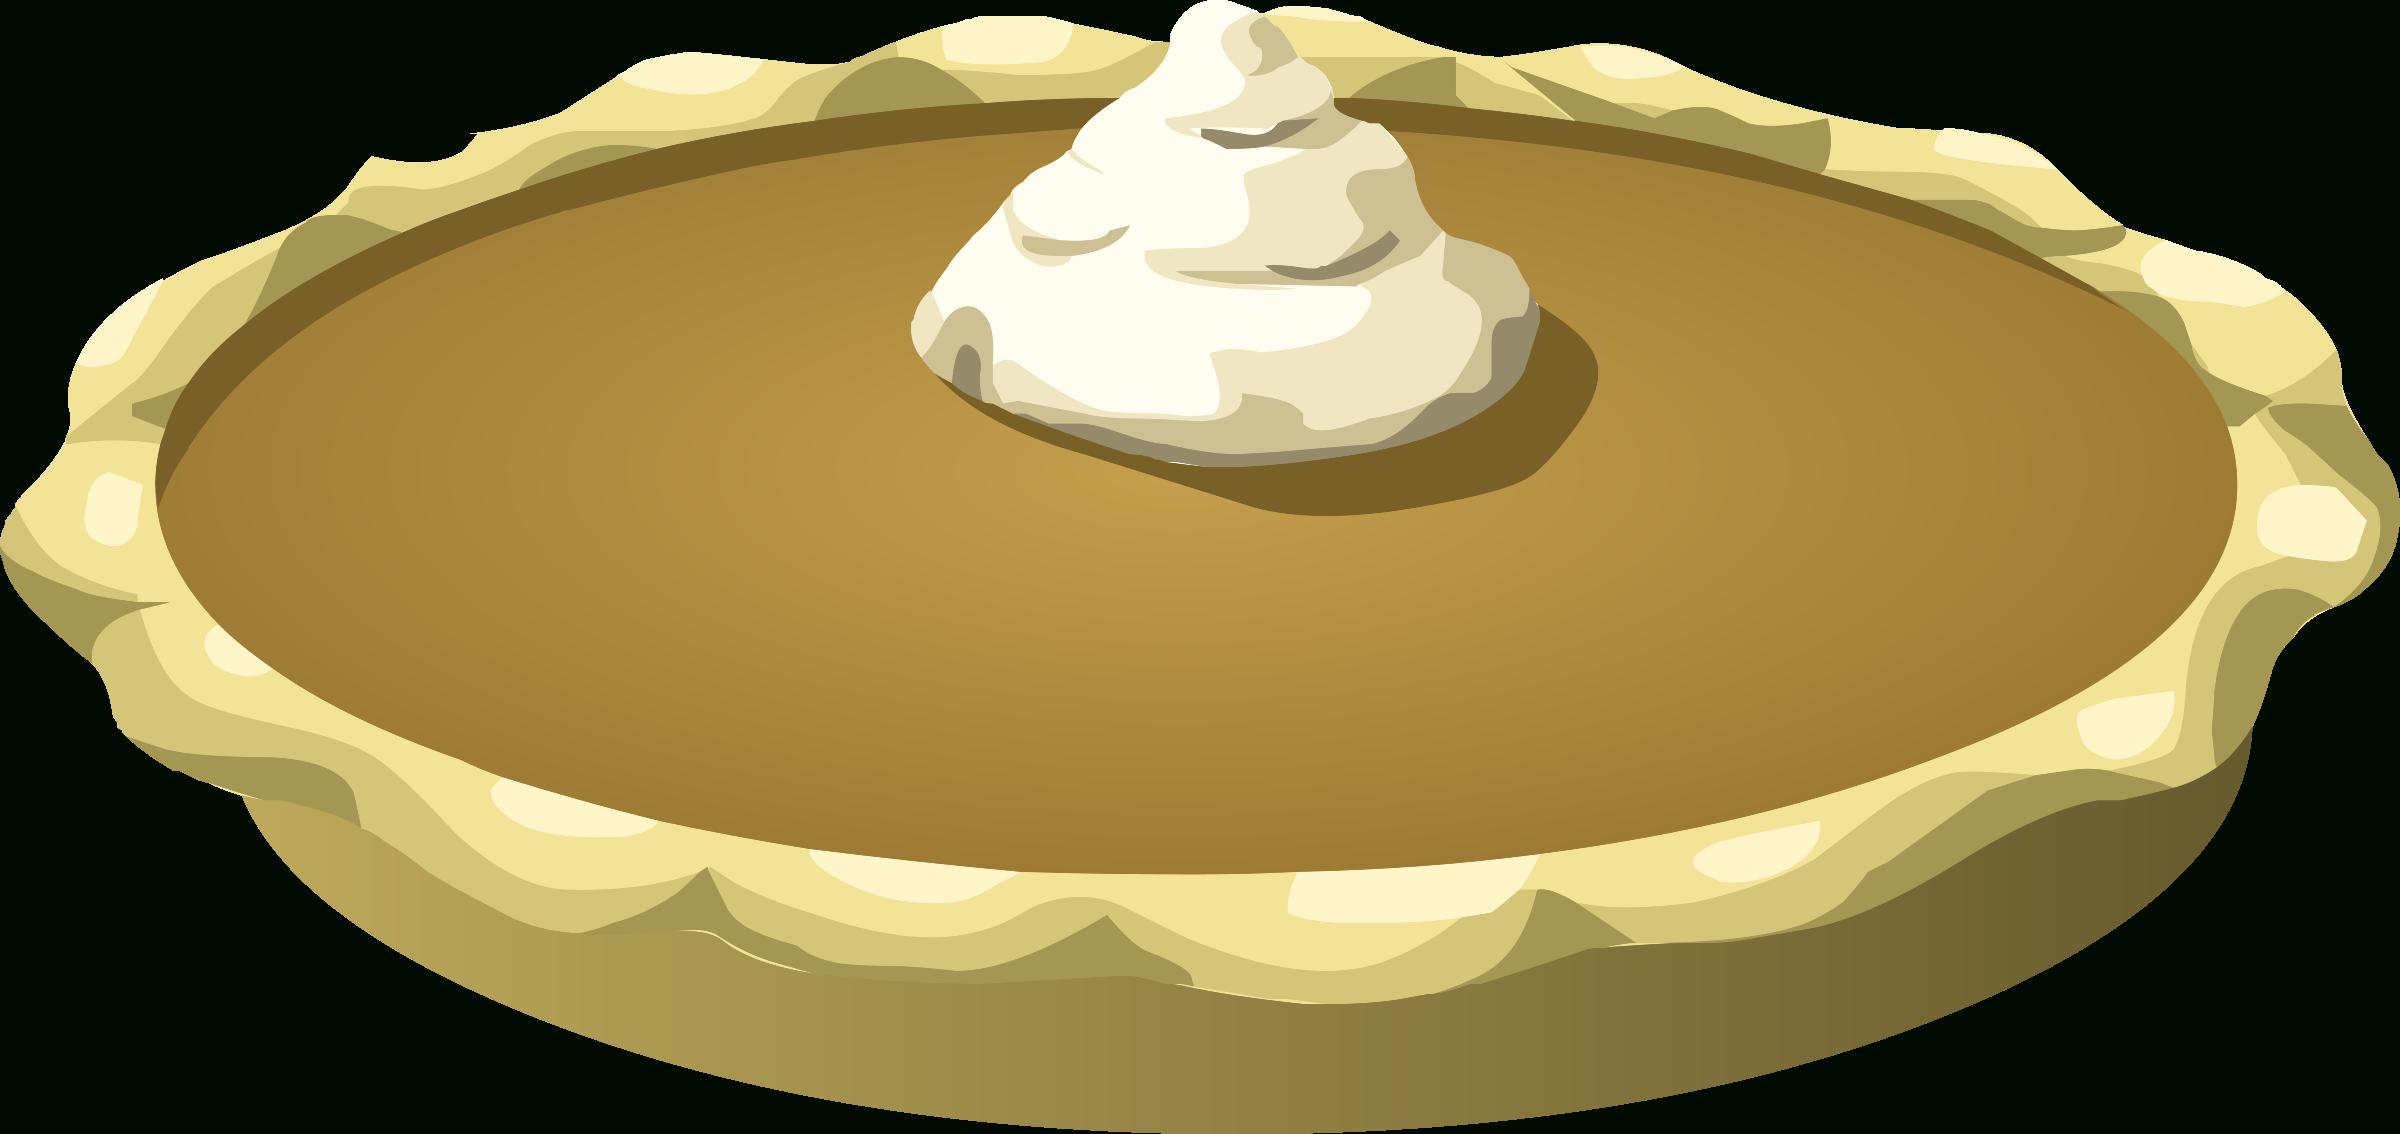 Slice of pumpkin pie clipart image transparent download Pie Clipart transparent background - Free Clipart on Dumielauxepices.net image transparent download